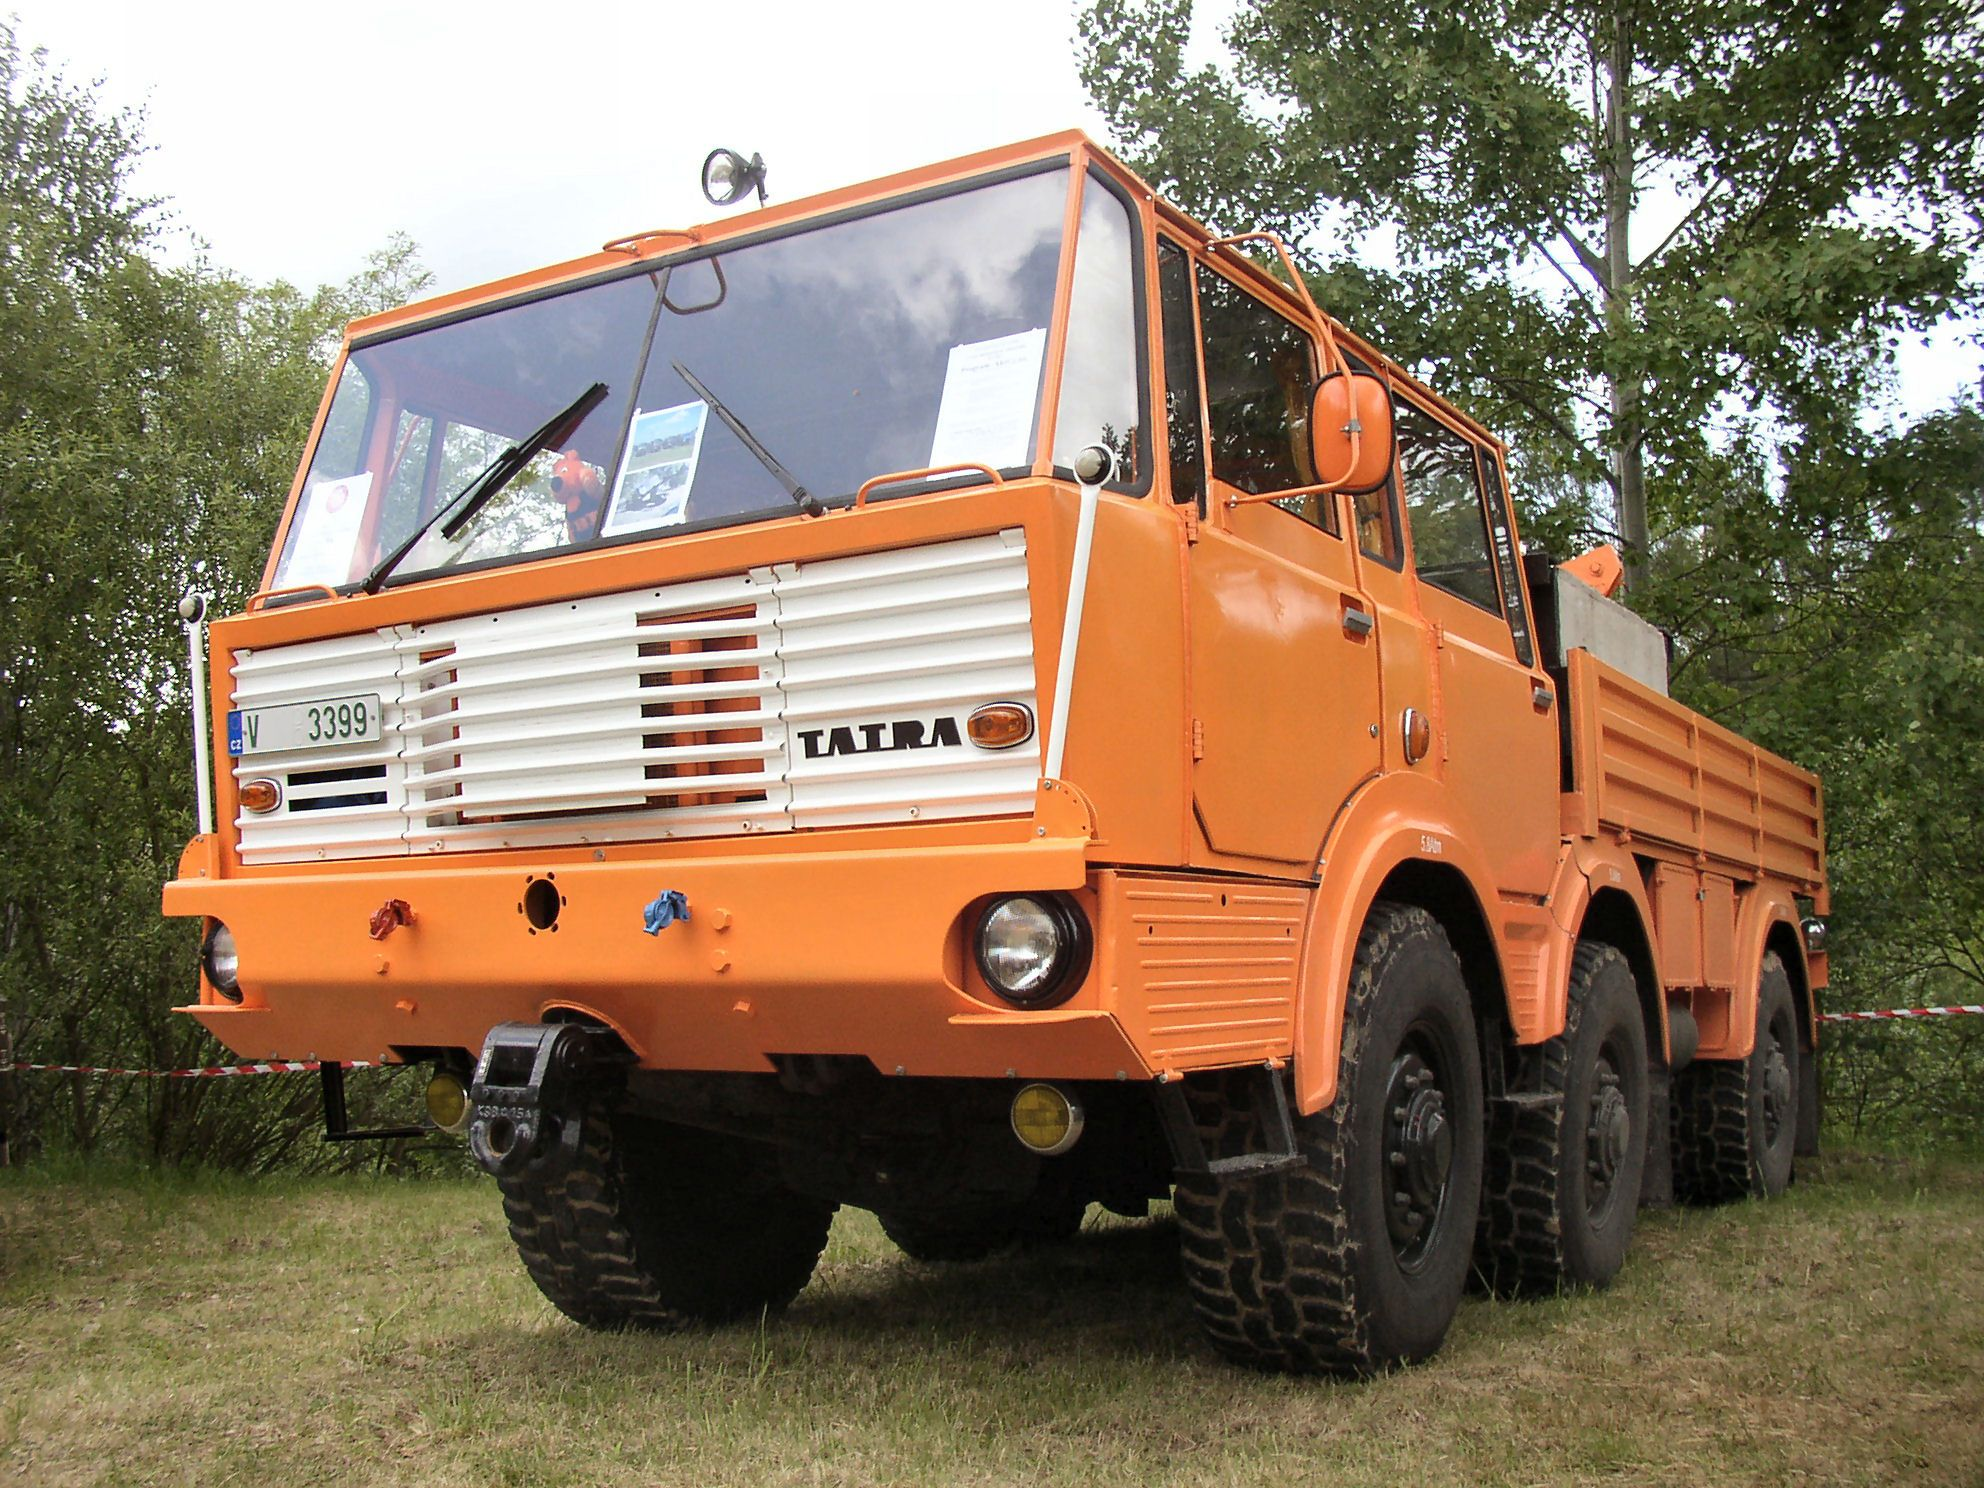 Tatra 813 kolos tatra czech republic kop ivnice pinterest 4x4 heavy truck and offroad